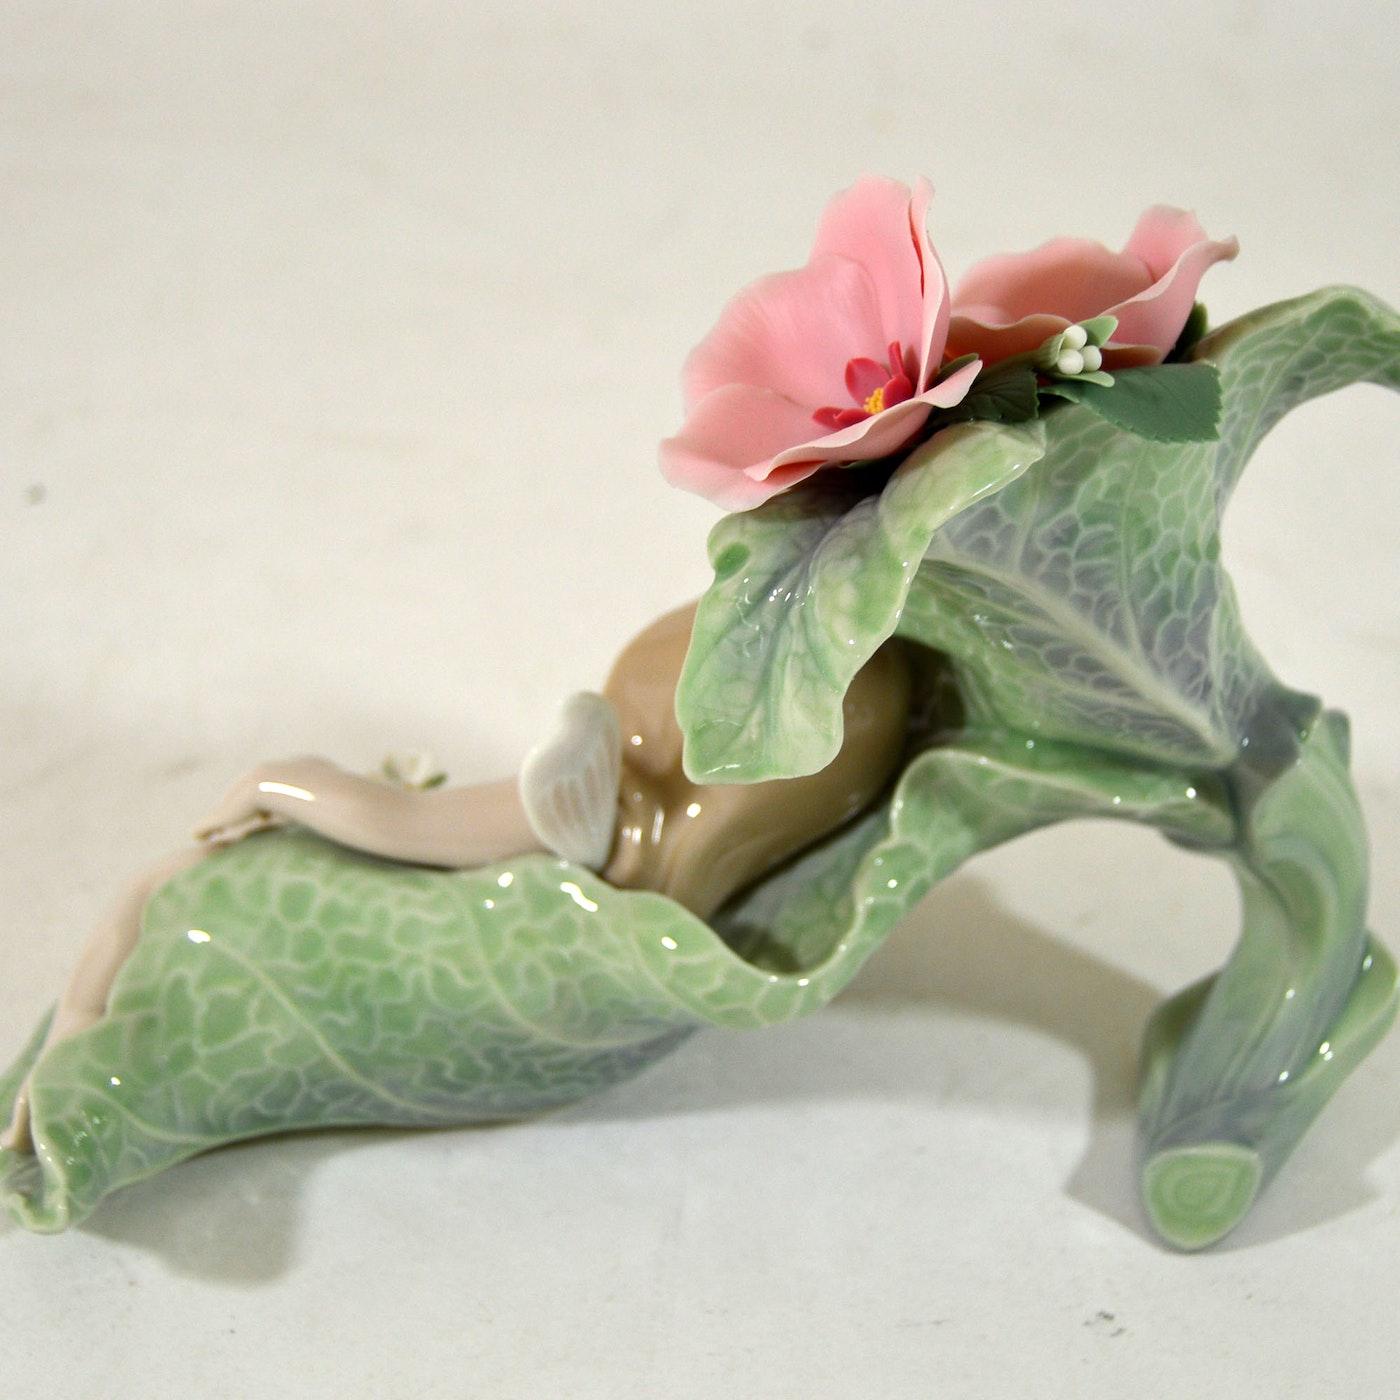 Lladr a visit to dreamland porcelain figurine ebth - Consider including lladro porcelain figurines home decoration ...